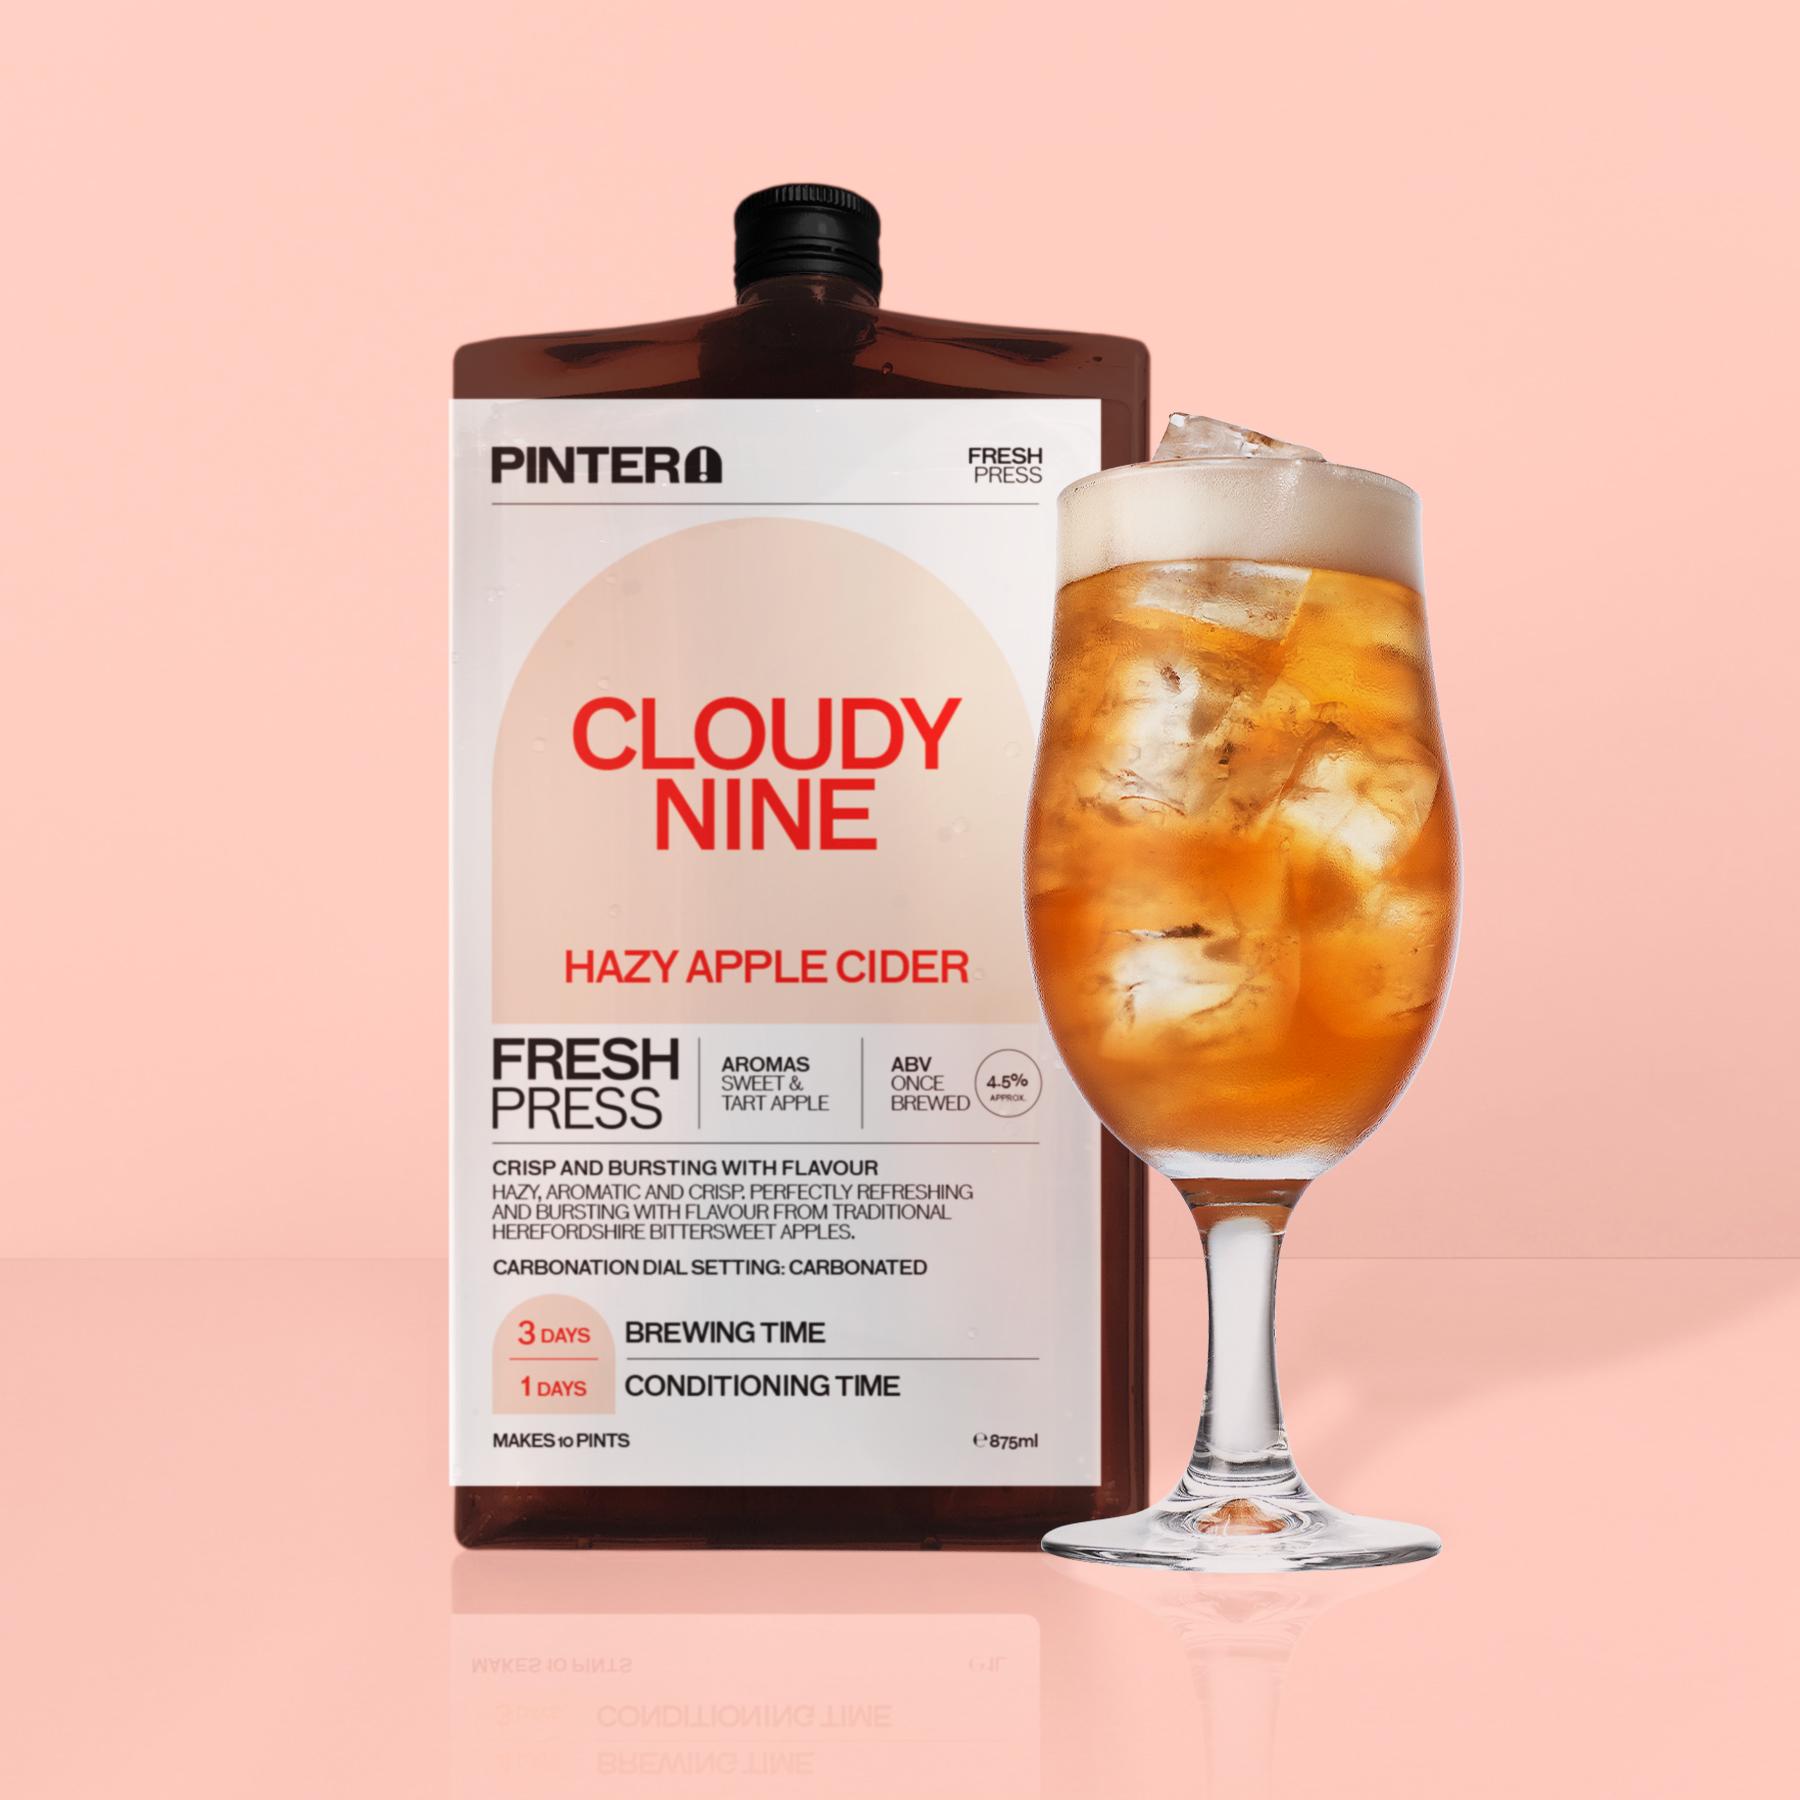 Cloudy Nine